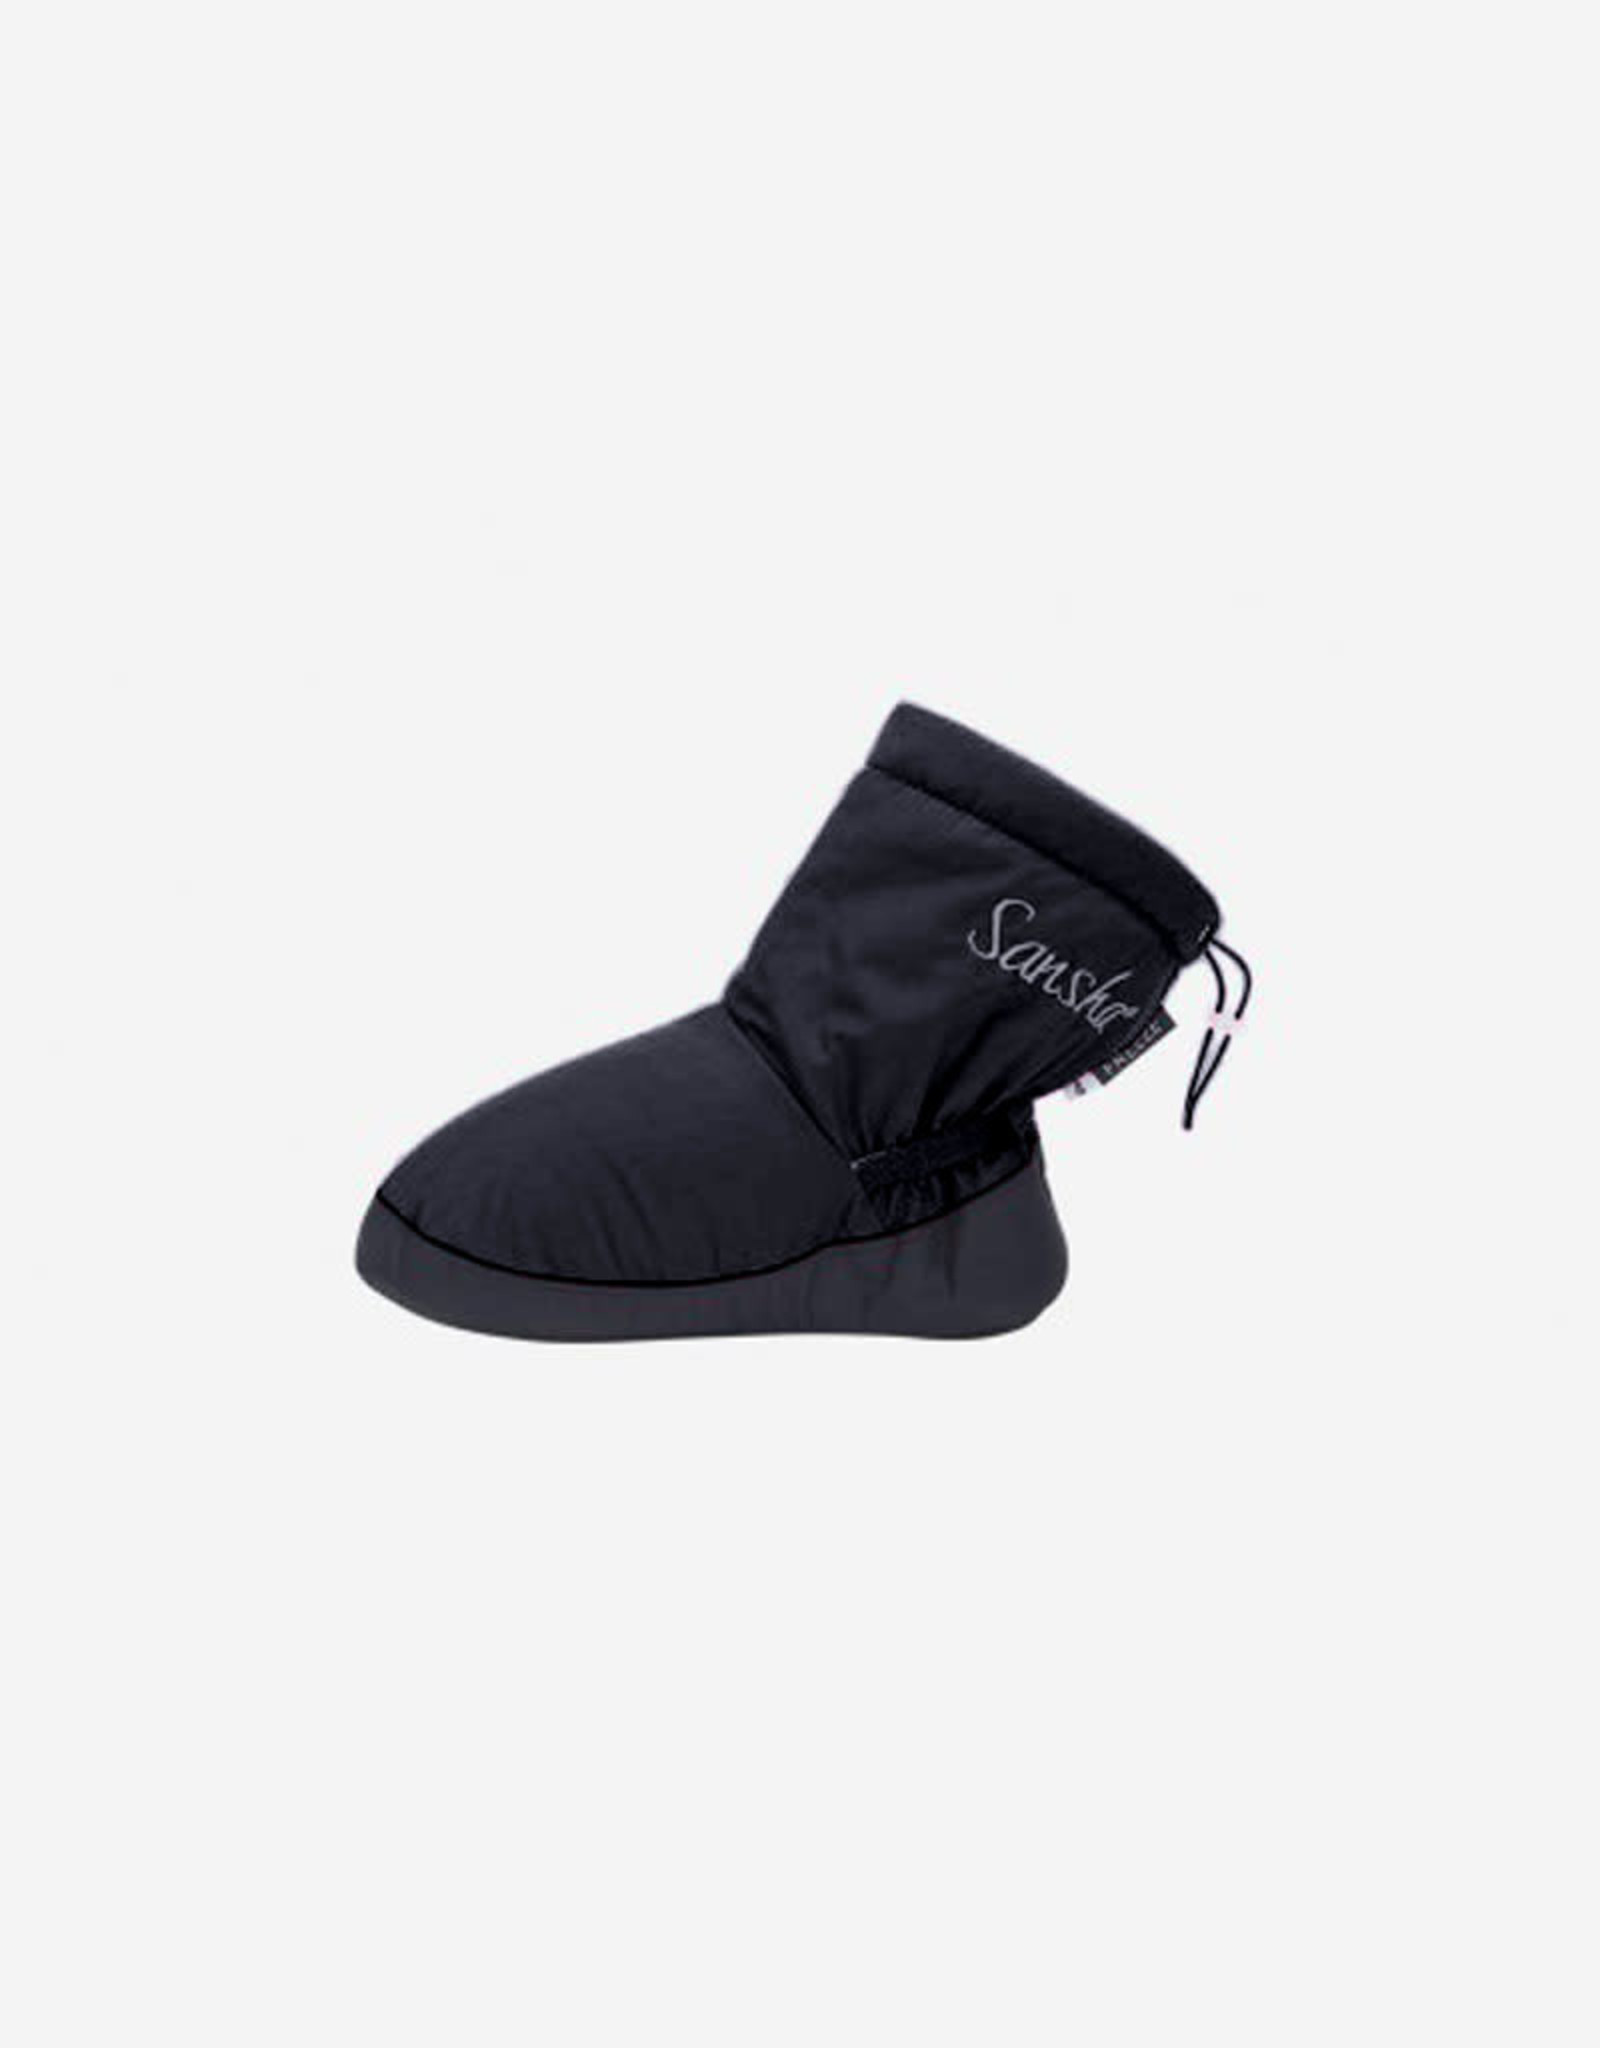 Sansha Warming boots Finlandia WOOM2